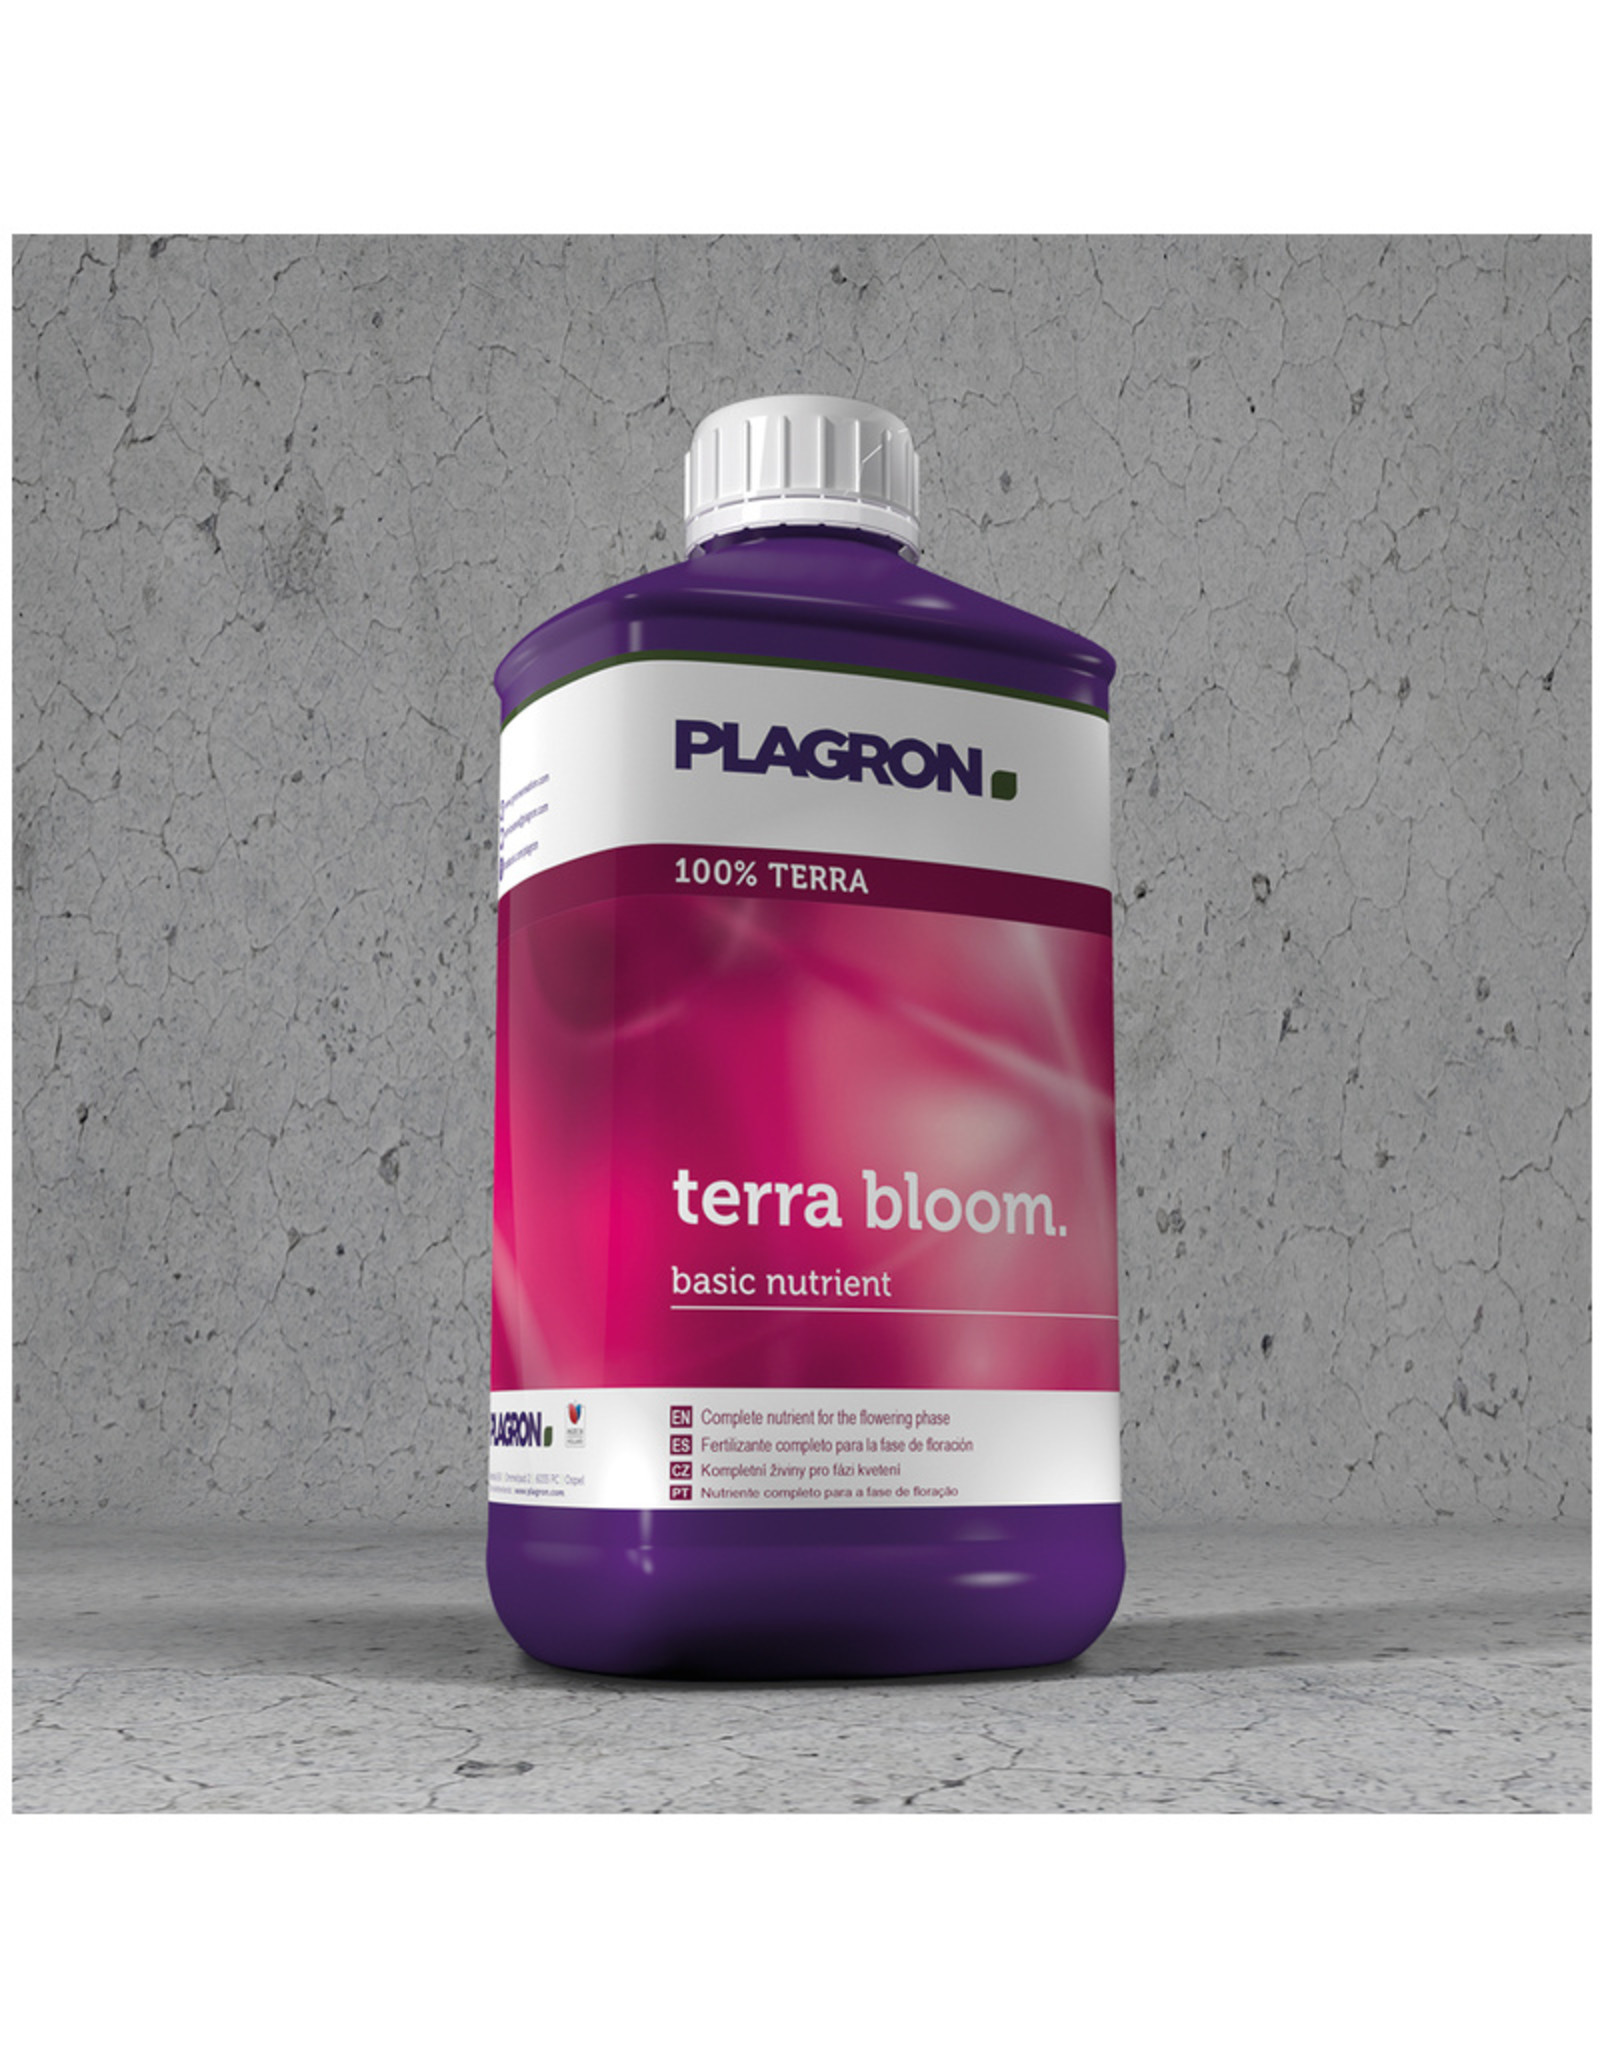 PLAGRON PLAGRON TERRA BLOOM